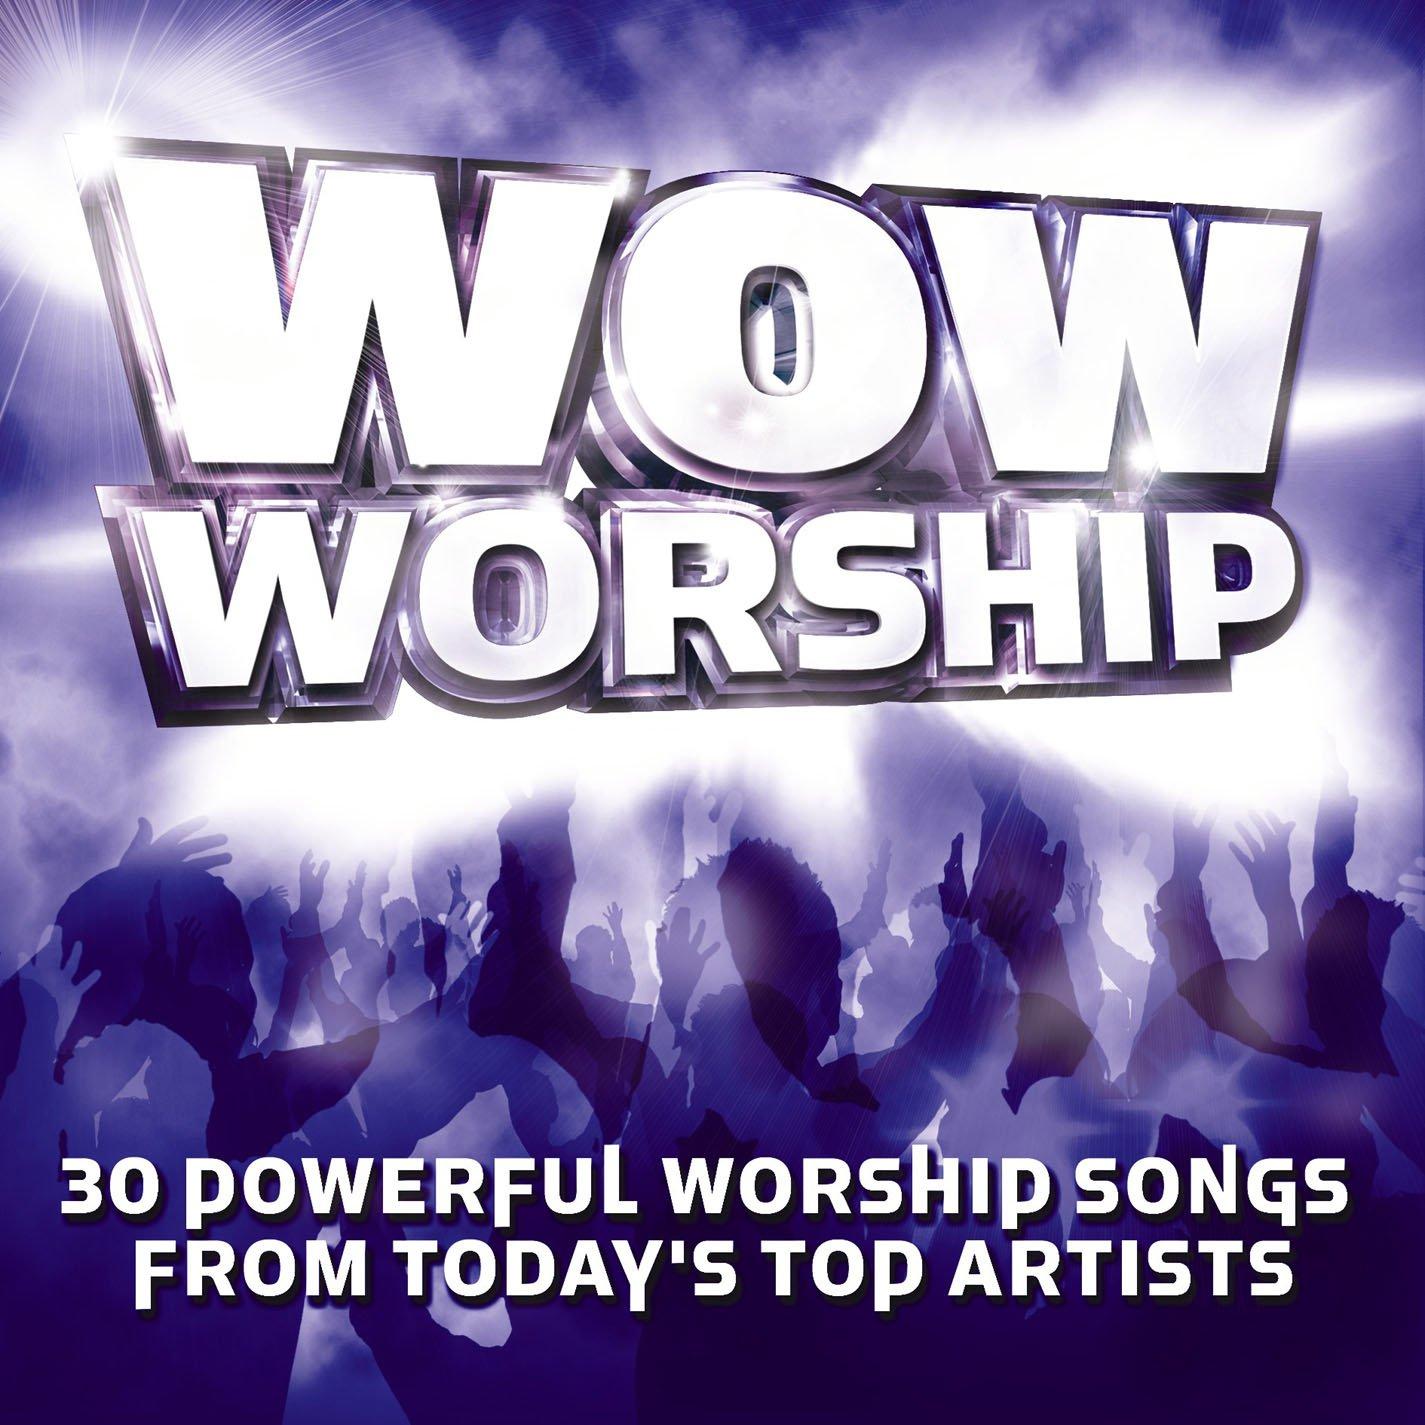 Powerful christian songs